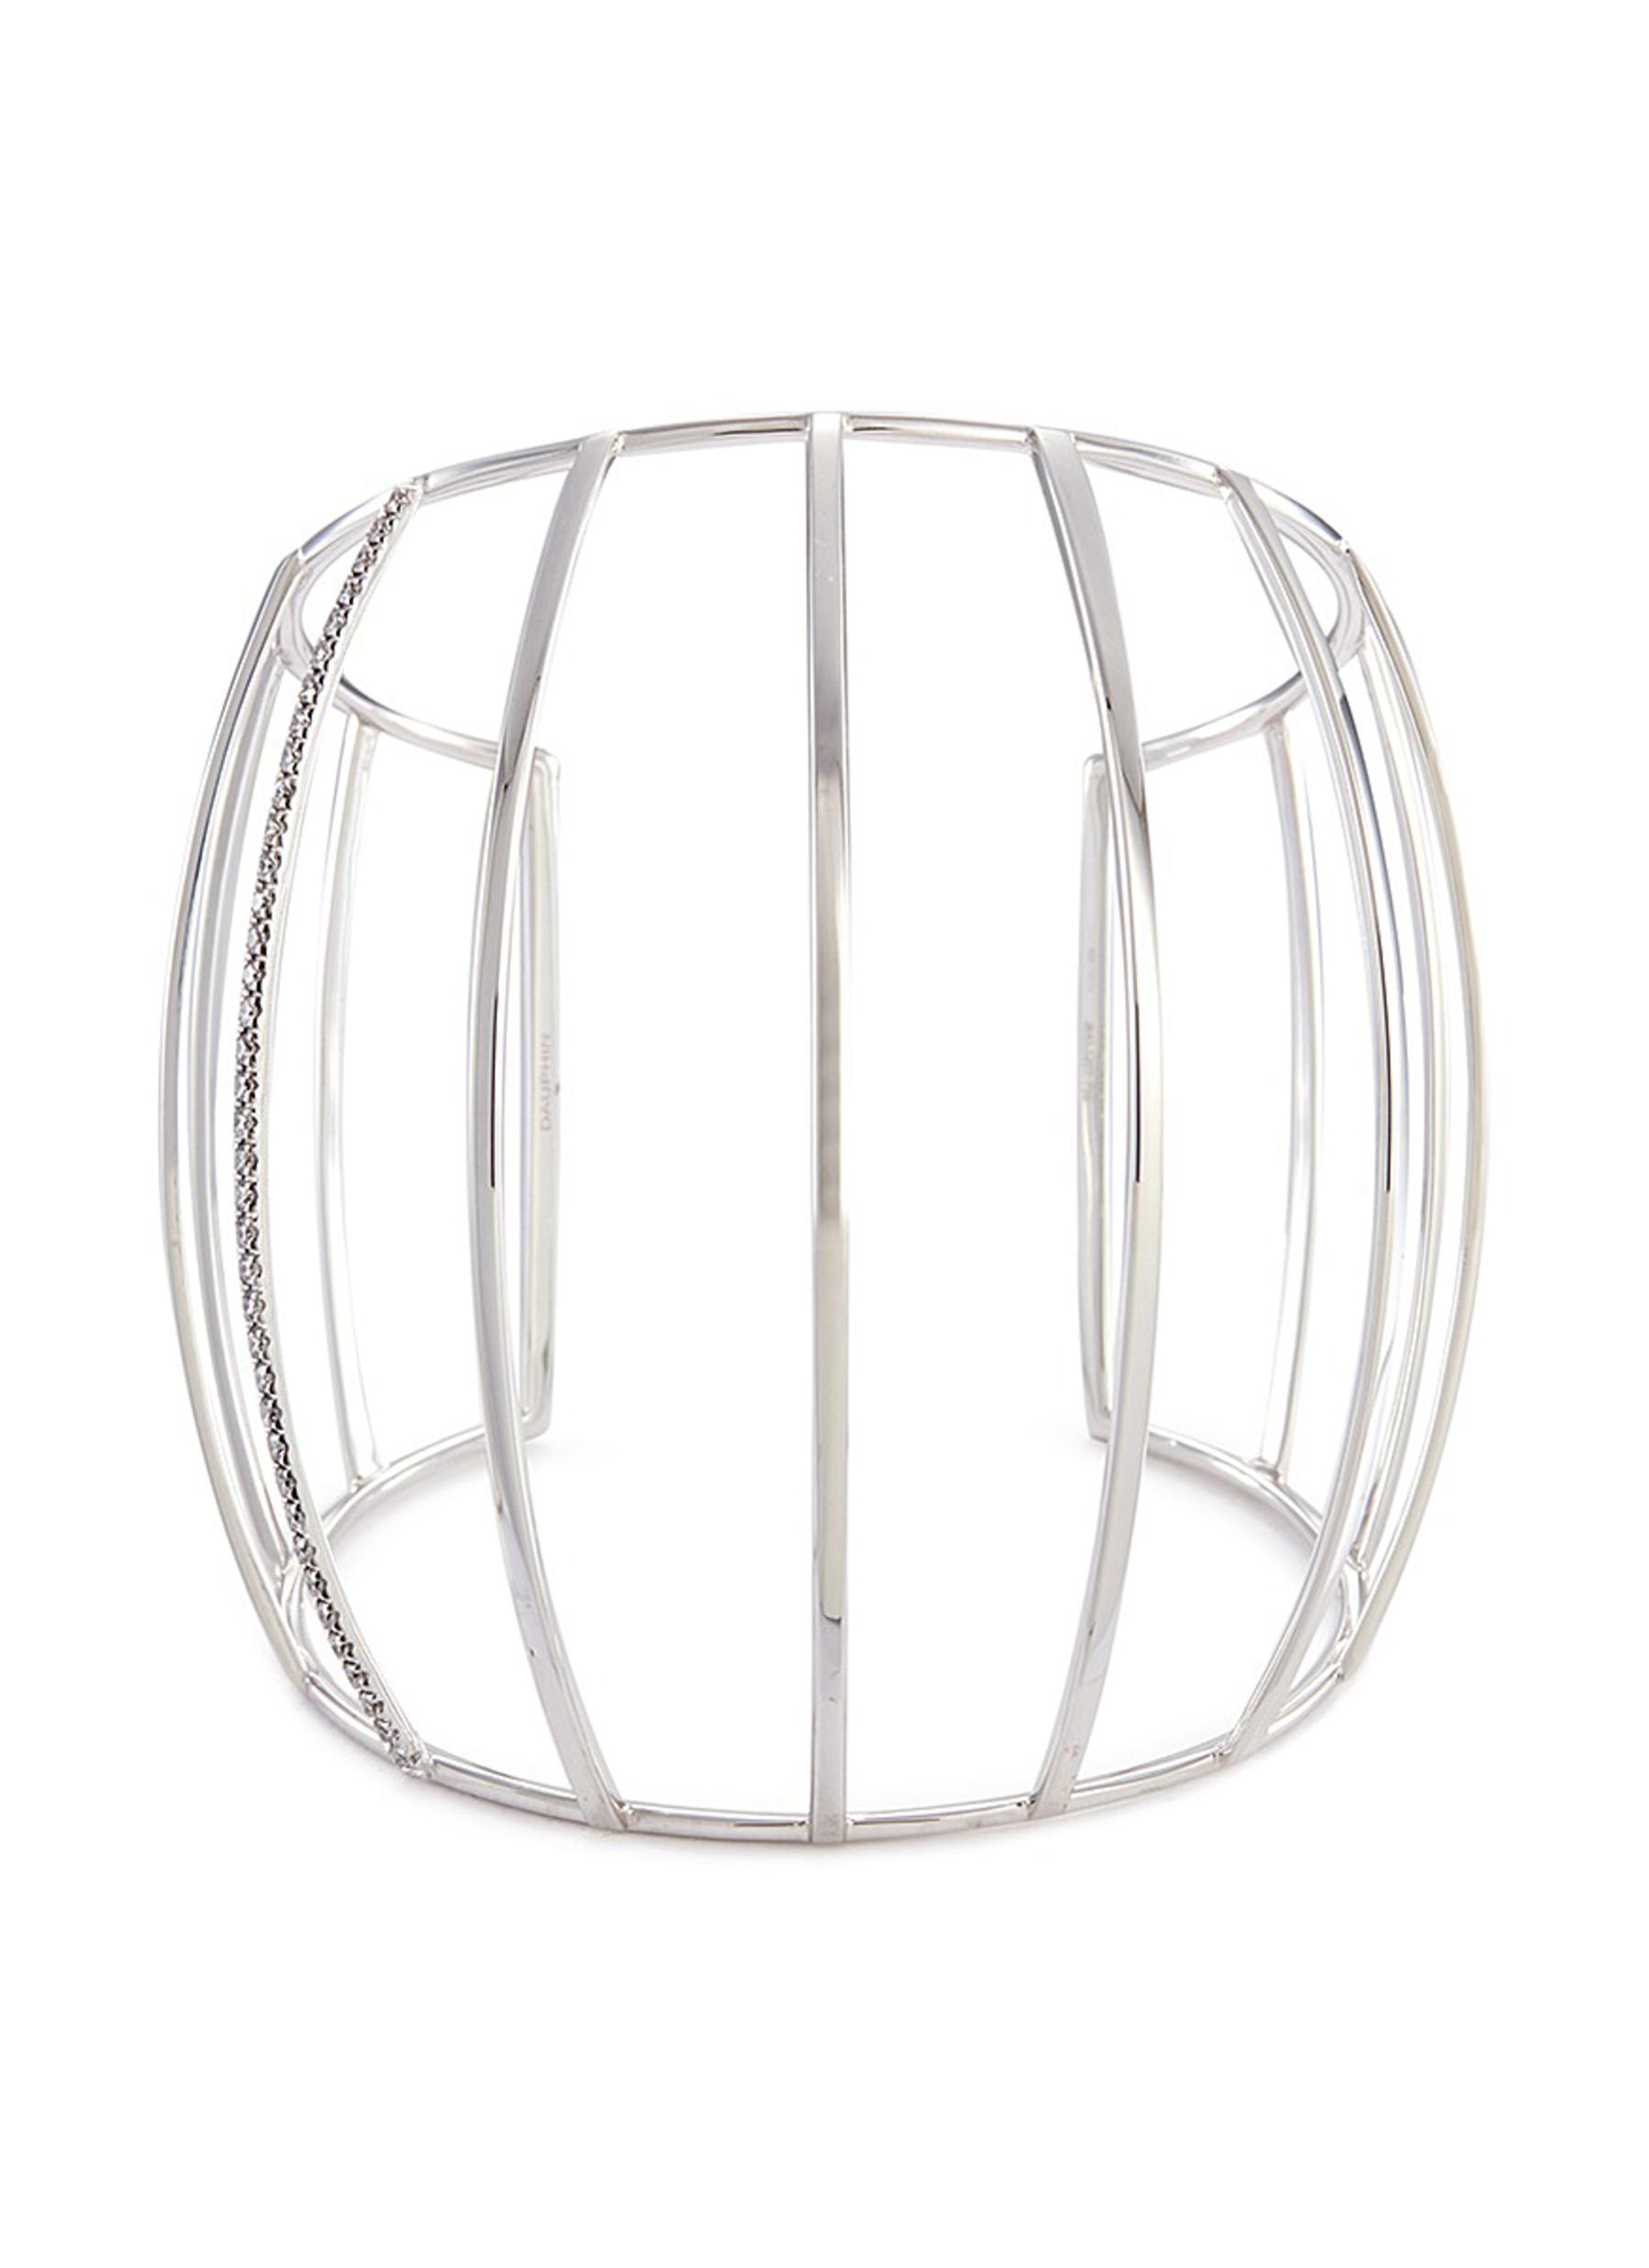 Diamond 18k white gold caged cuff